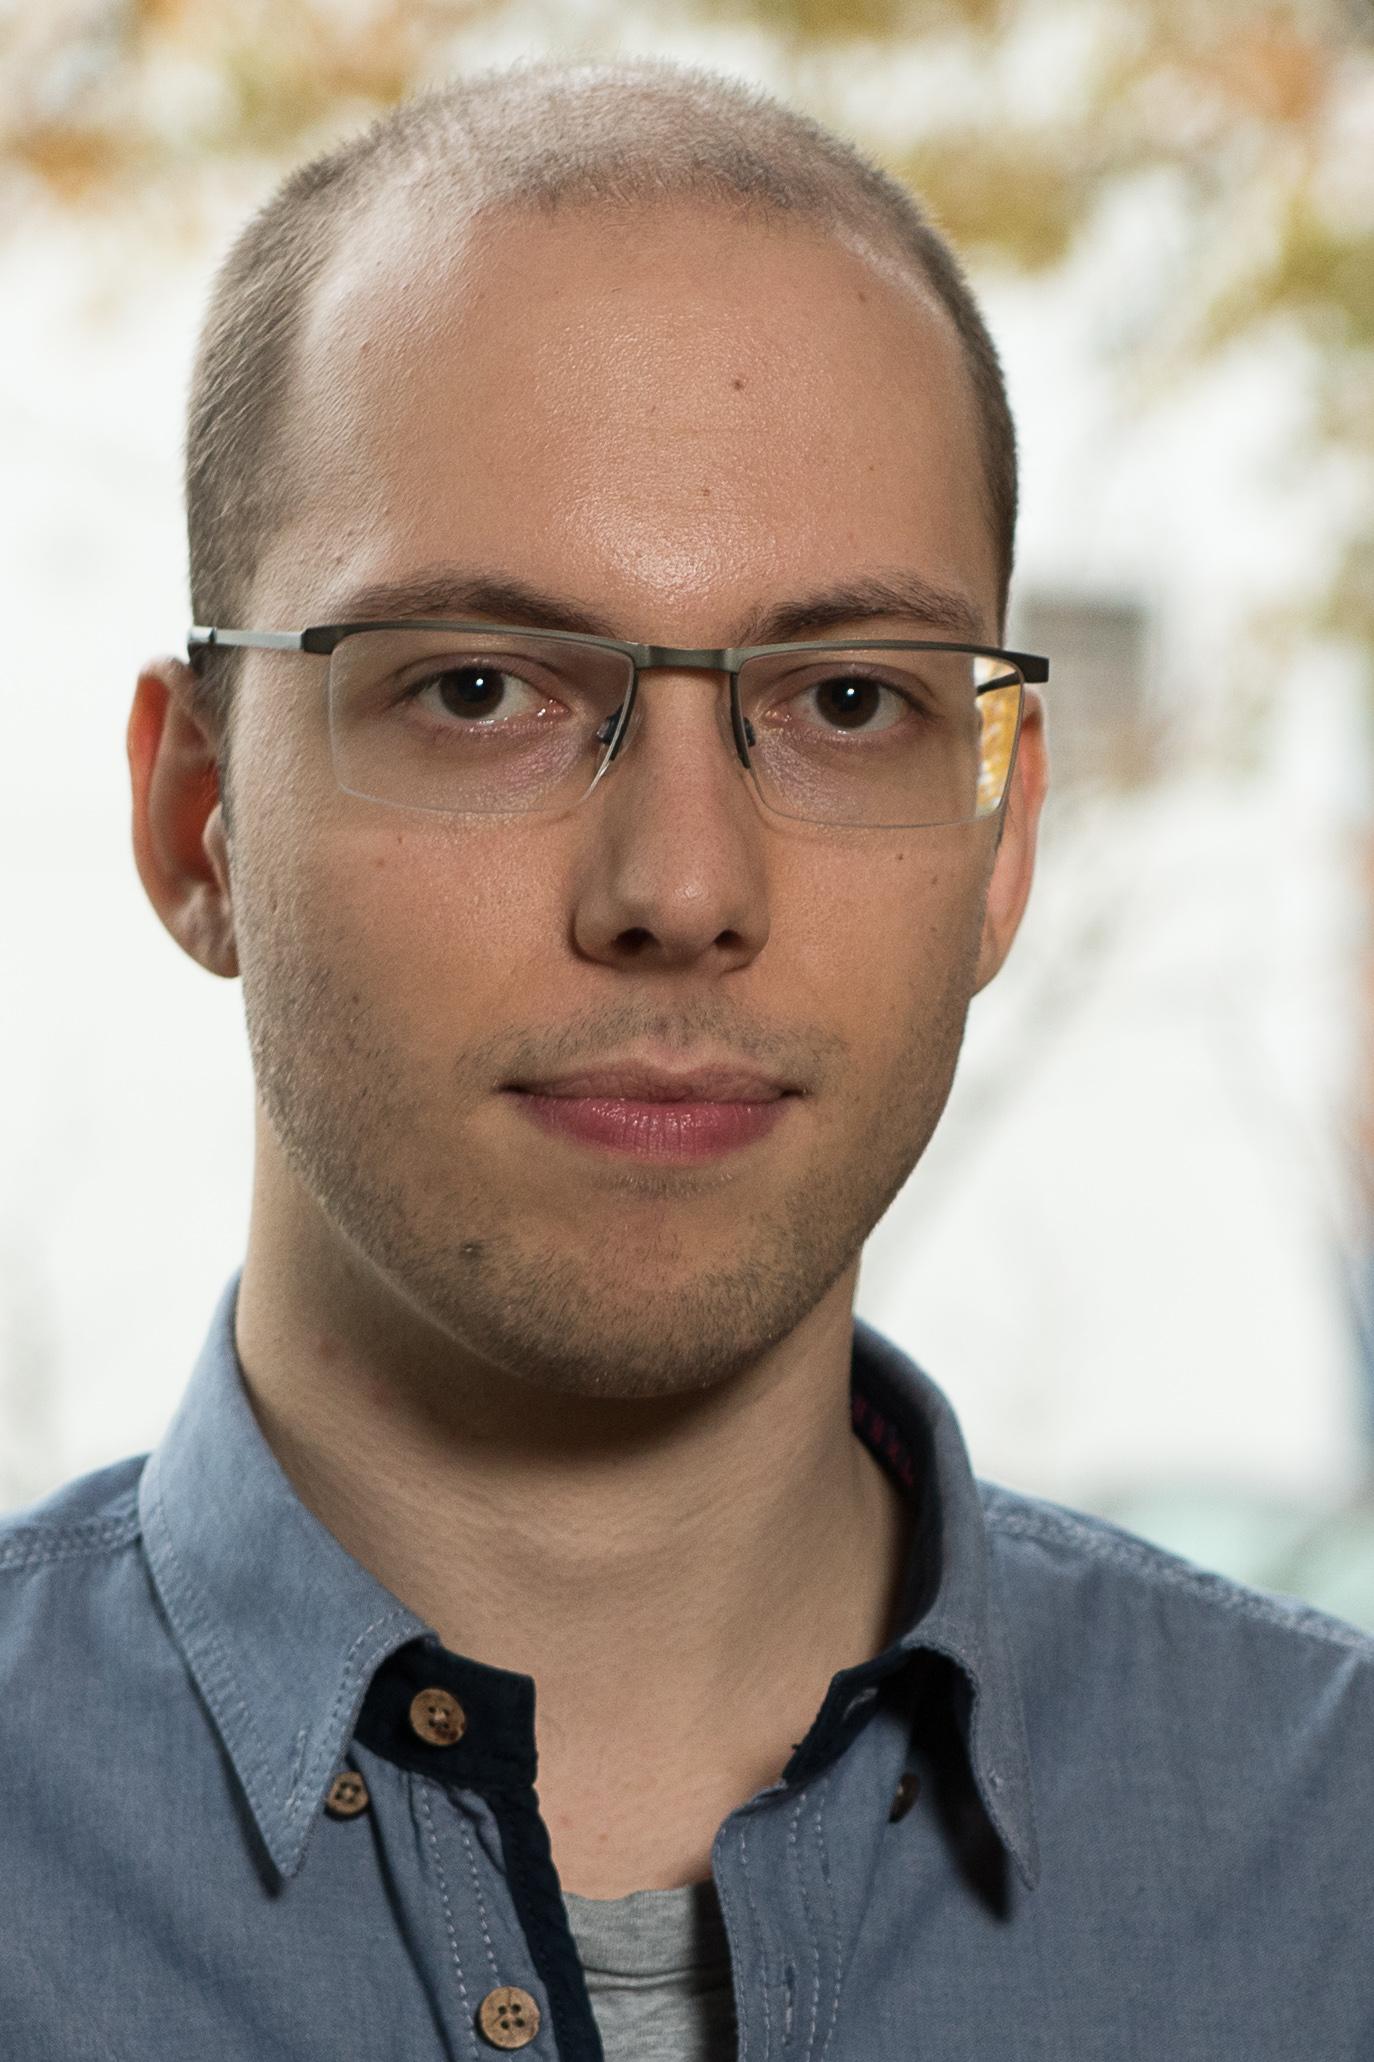 Thorsten Zirwes